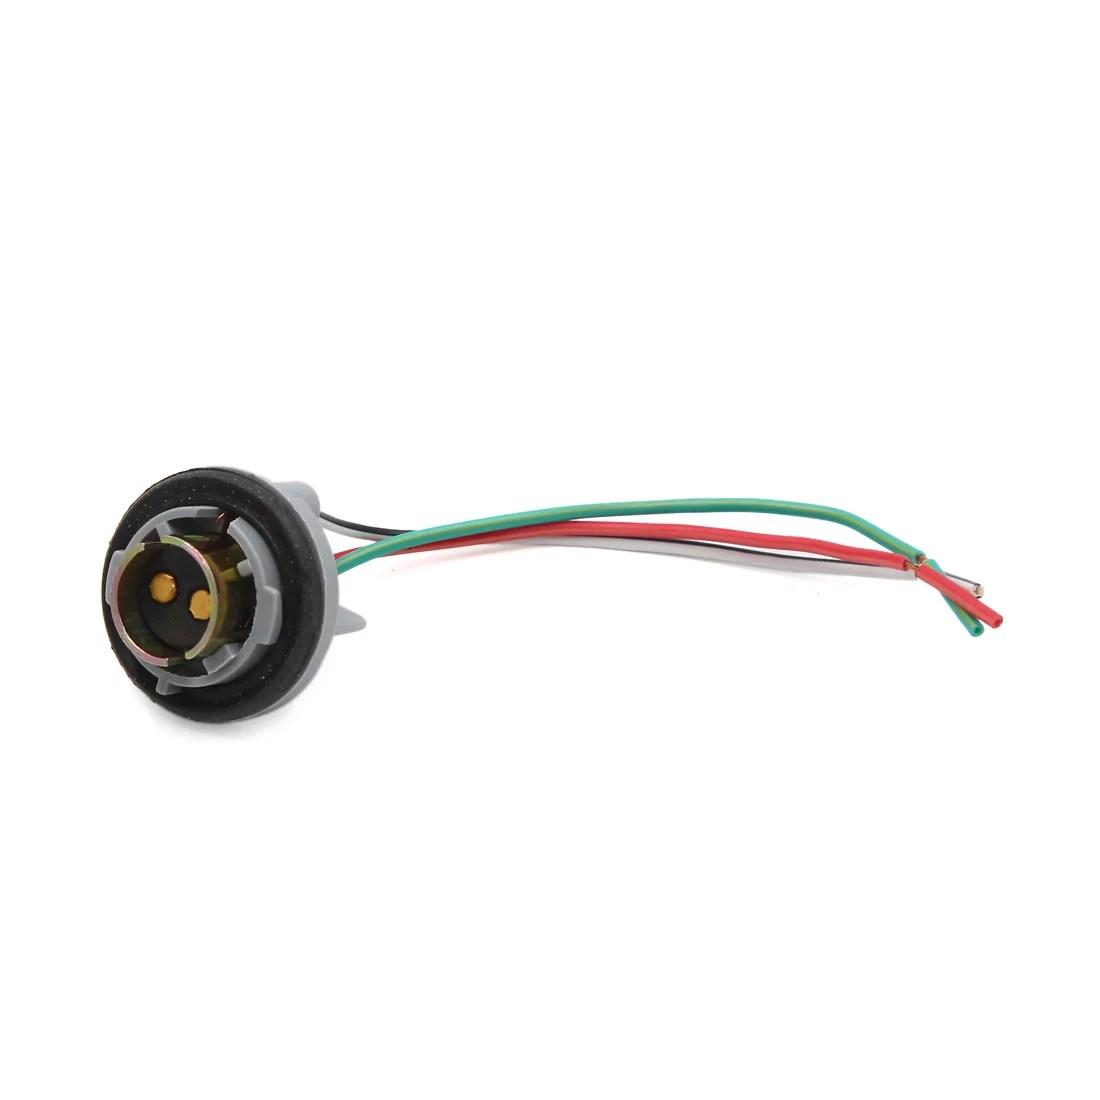 hight resolution of 1157 turn light brake bulb socket connector wire harness for bulbs walmart com